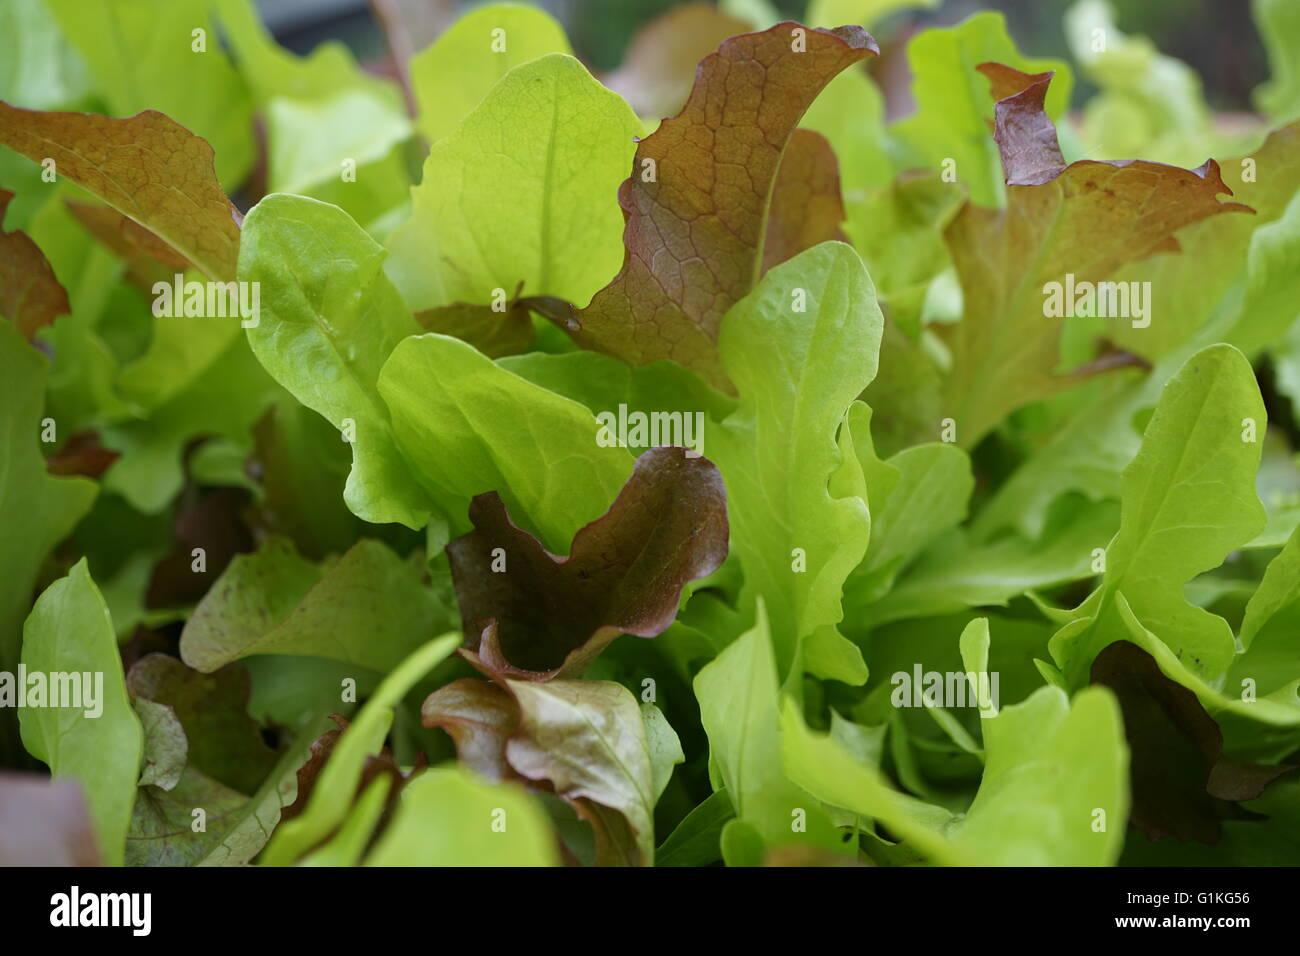 Close up of a blend of loose leaf lettuce. - Stock Image